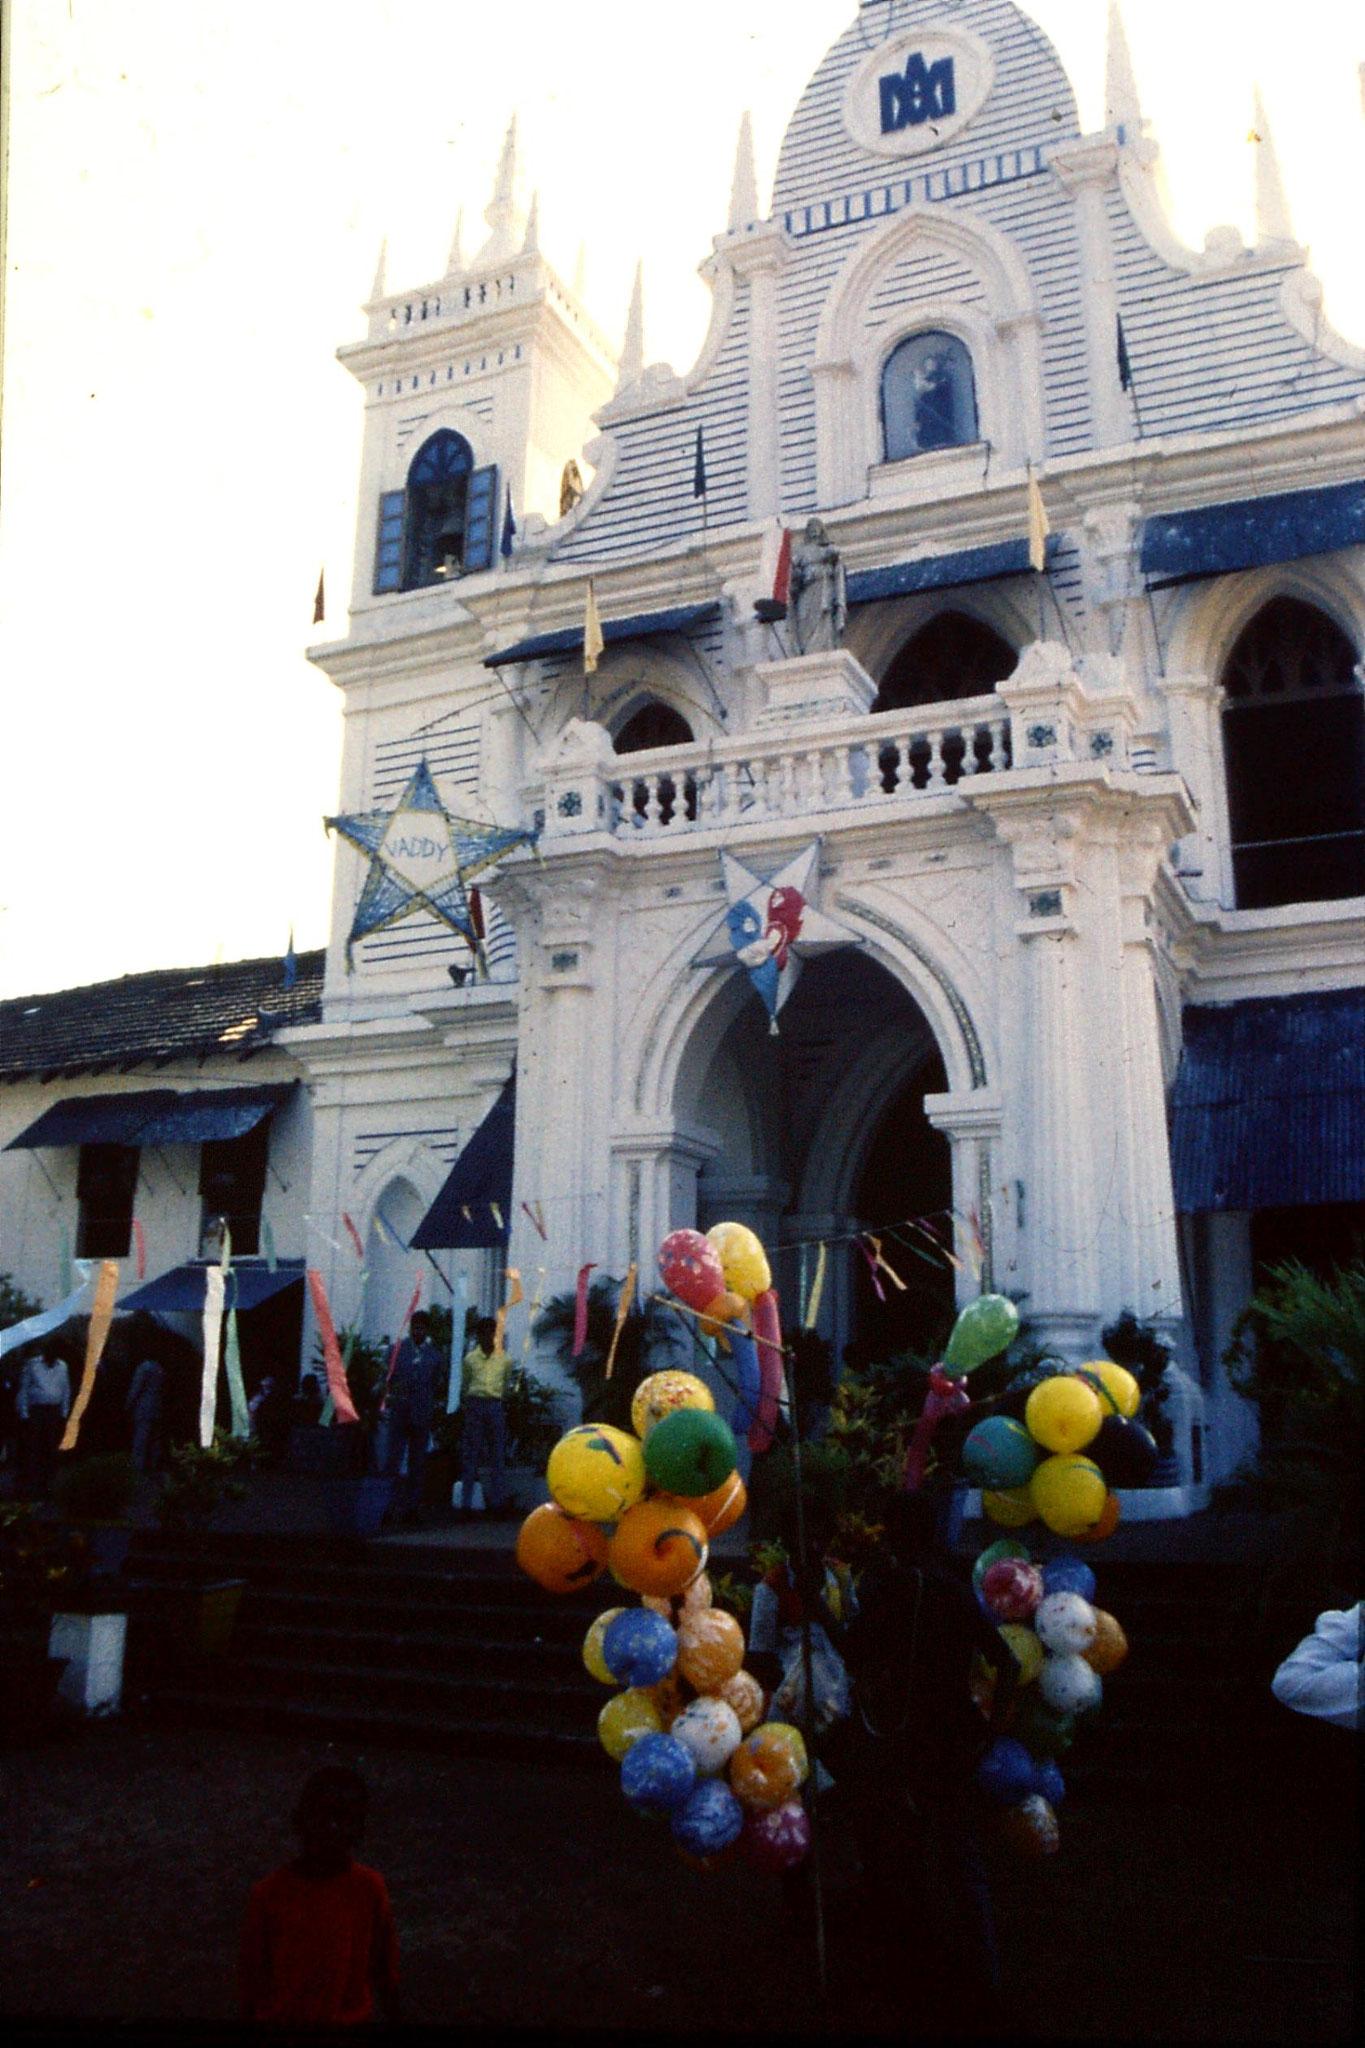 31/12/1989: 7: Siolim church and 10.30 mass